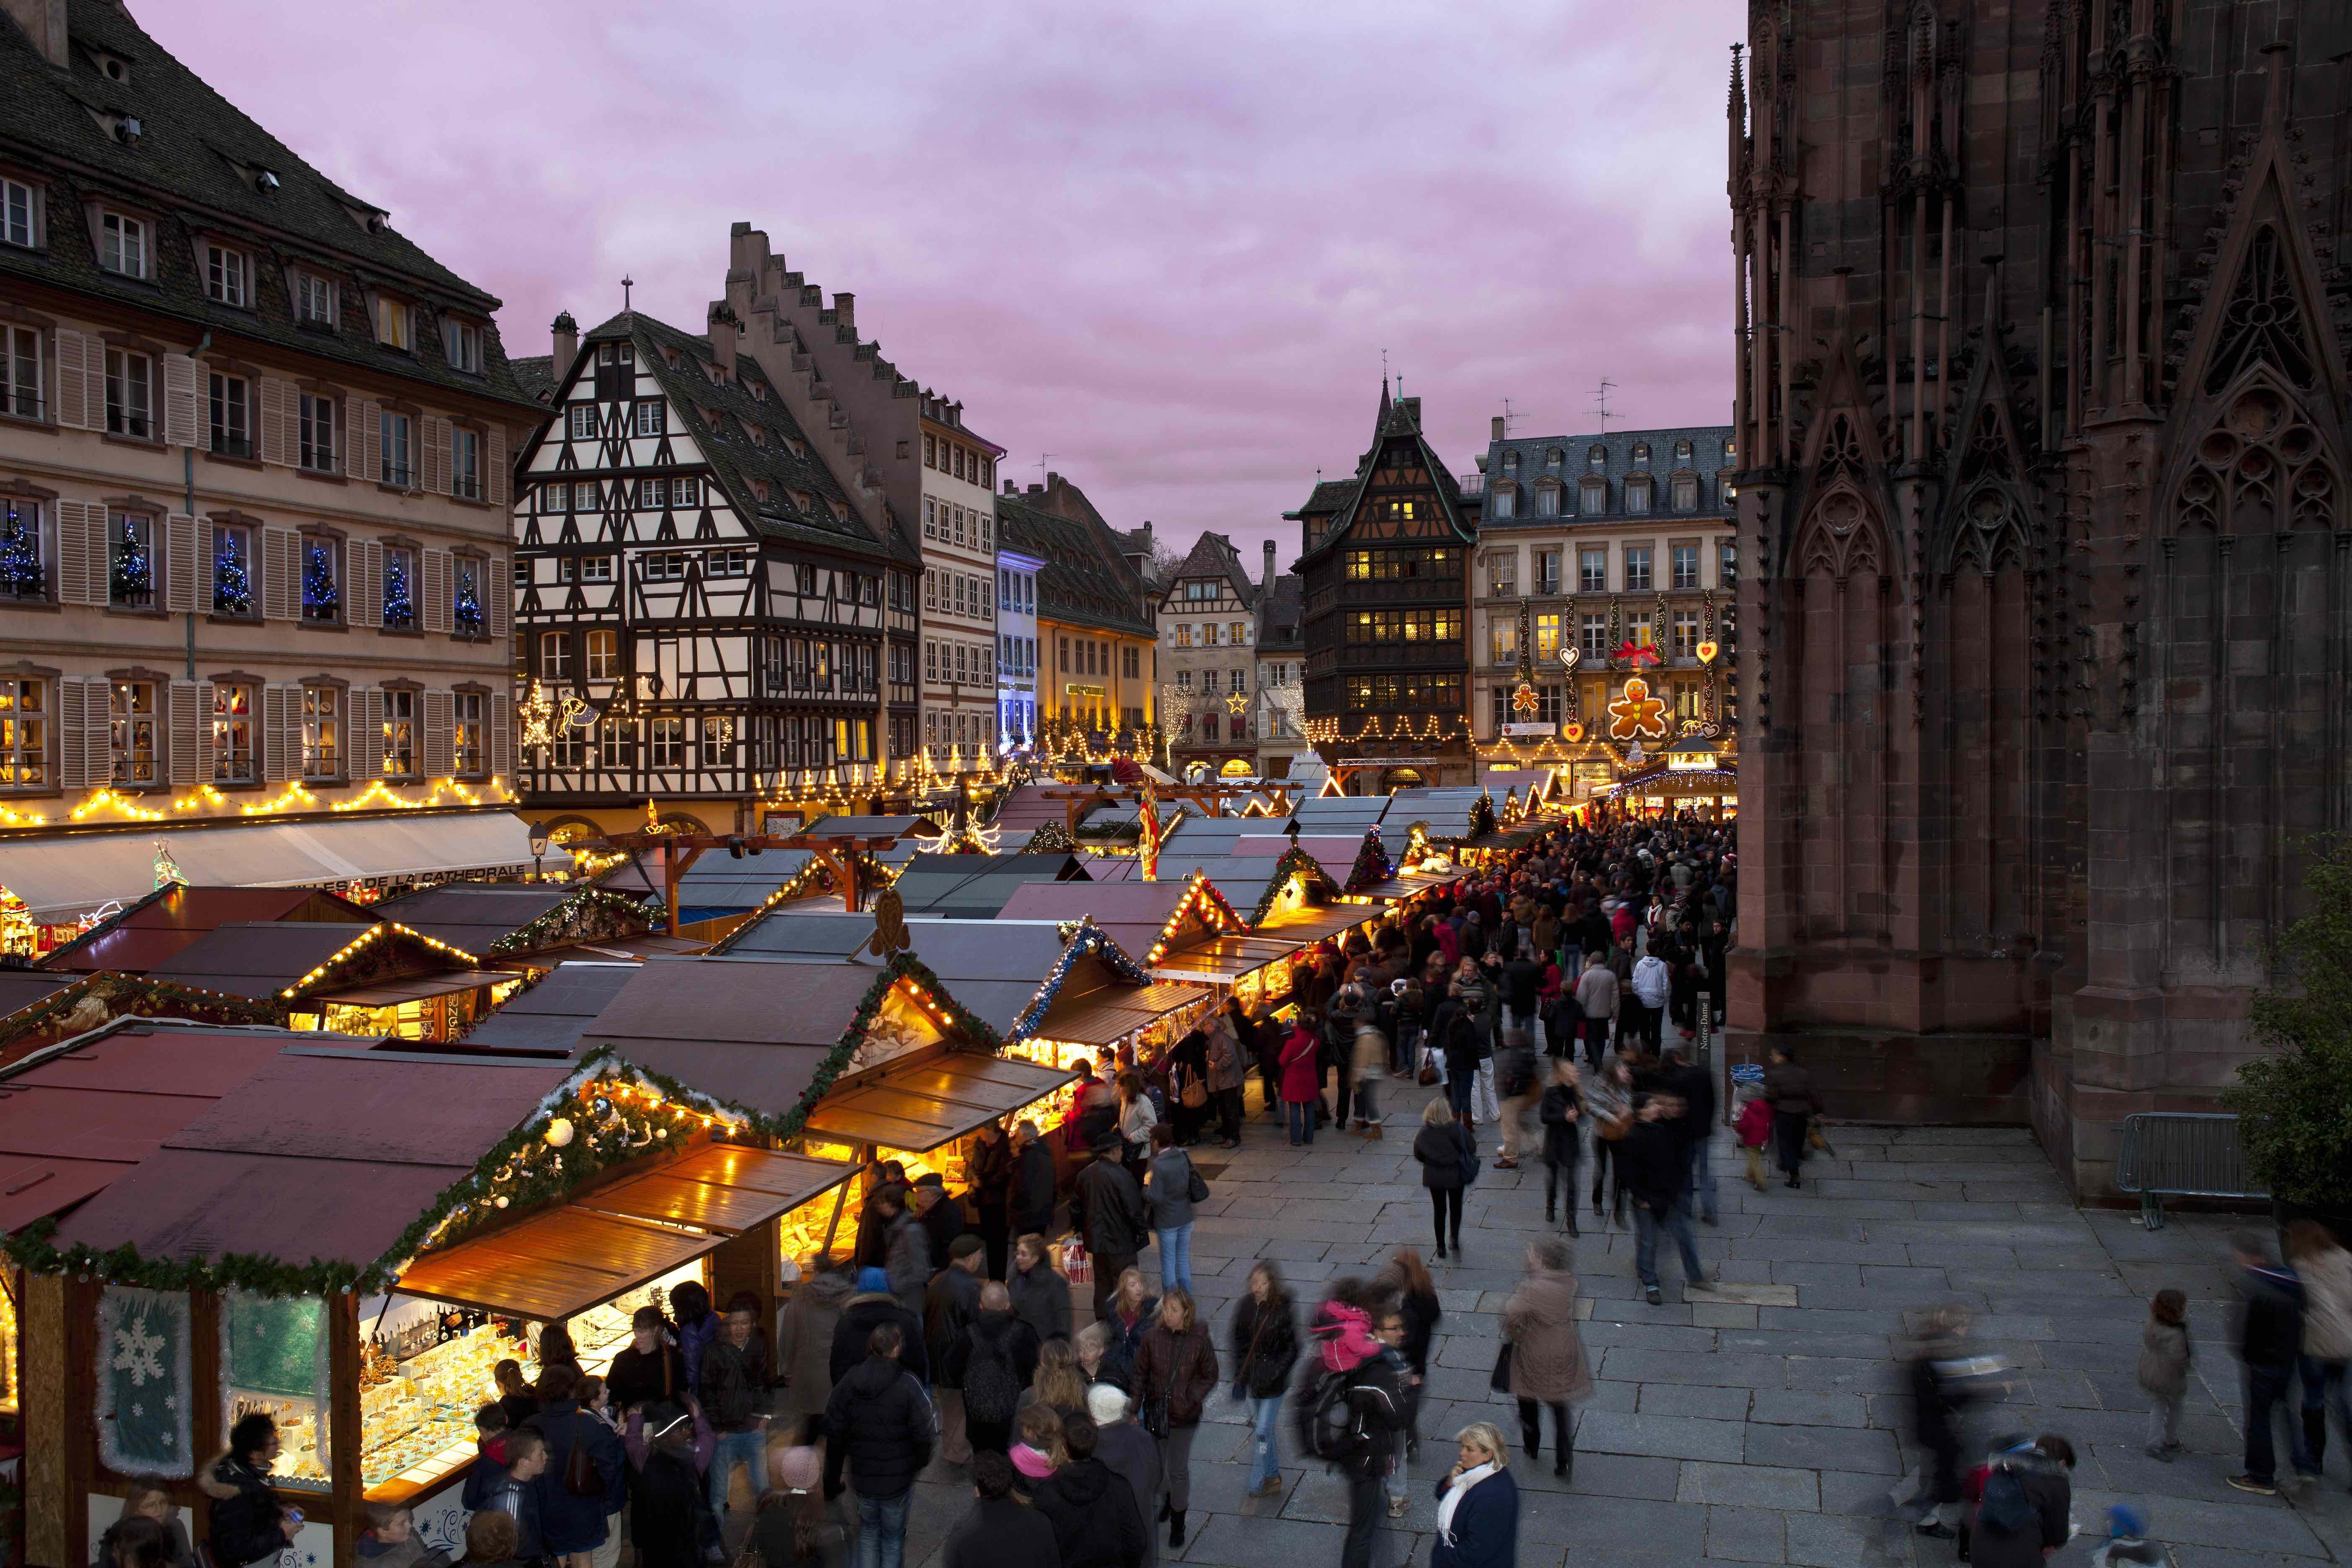 Christmas market in strasbourg france credit christophe hamm